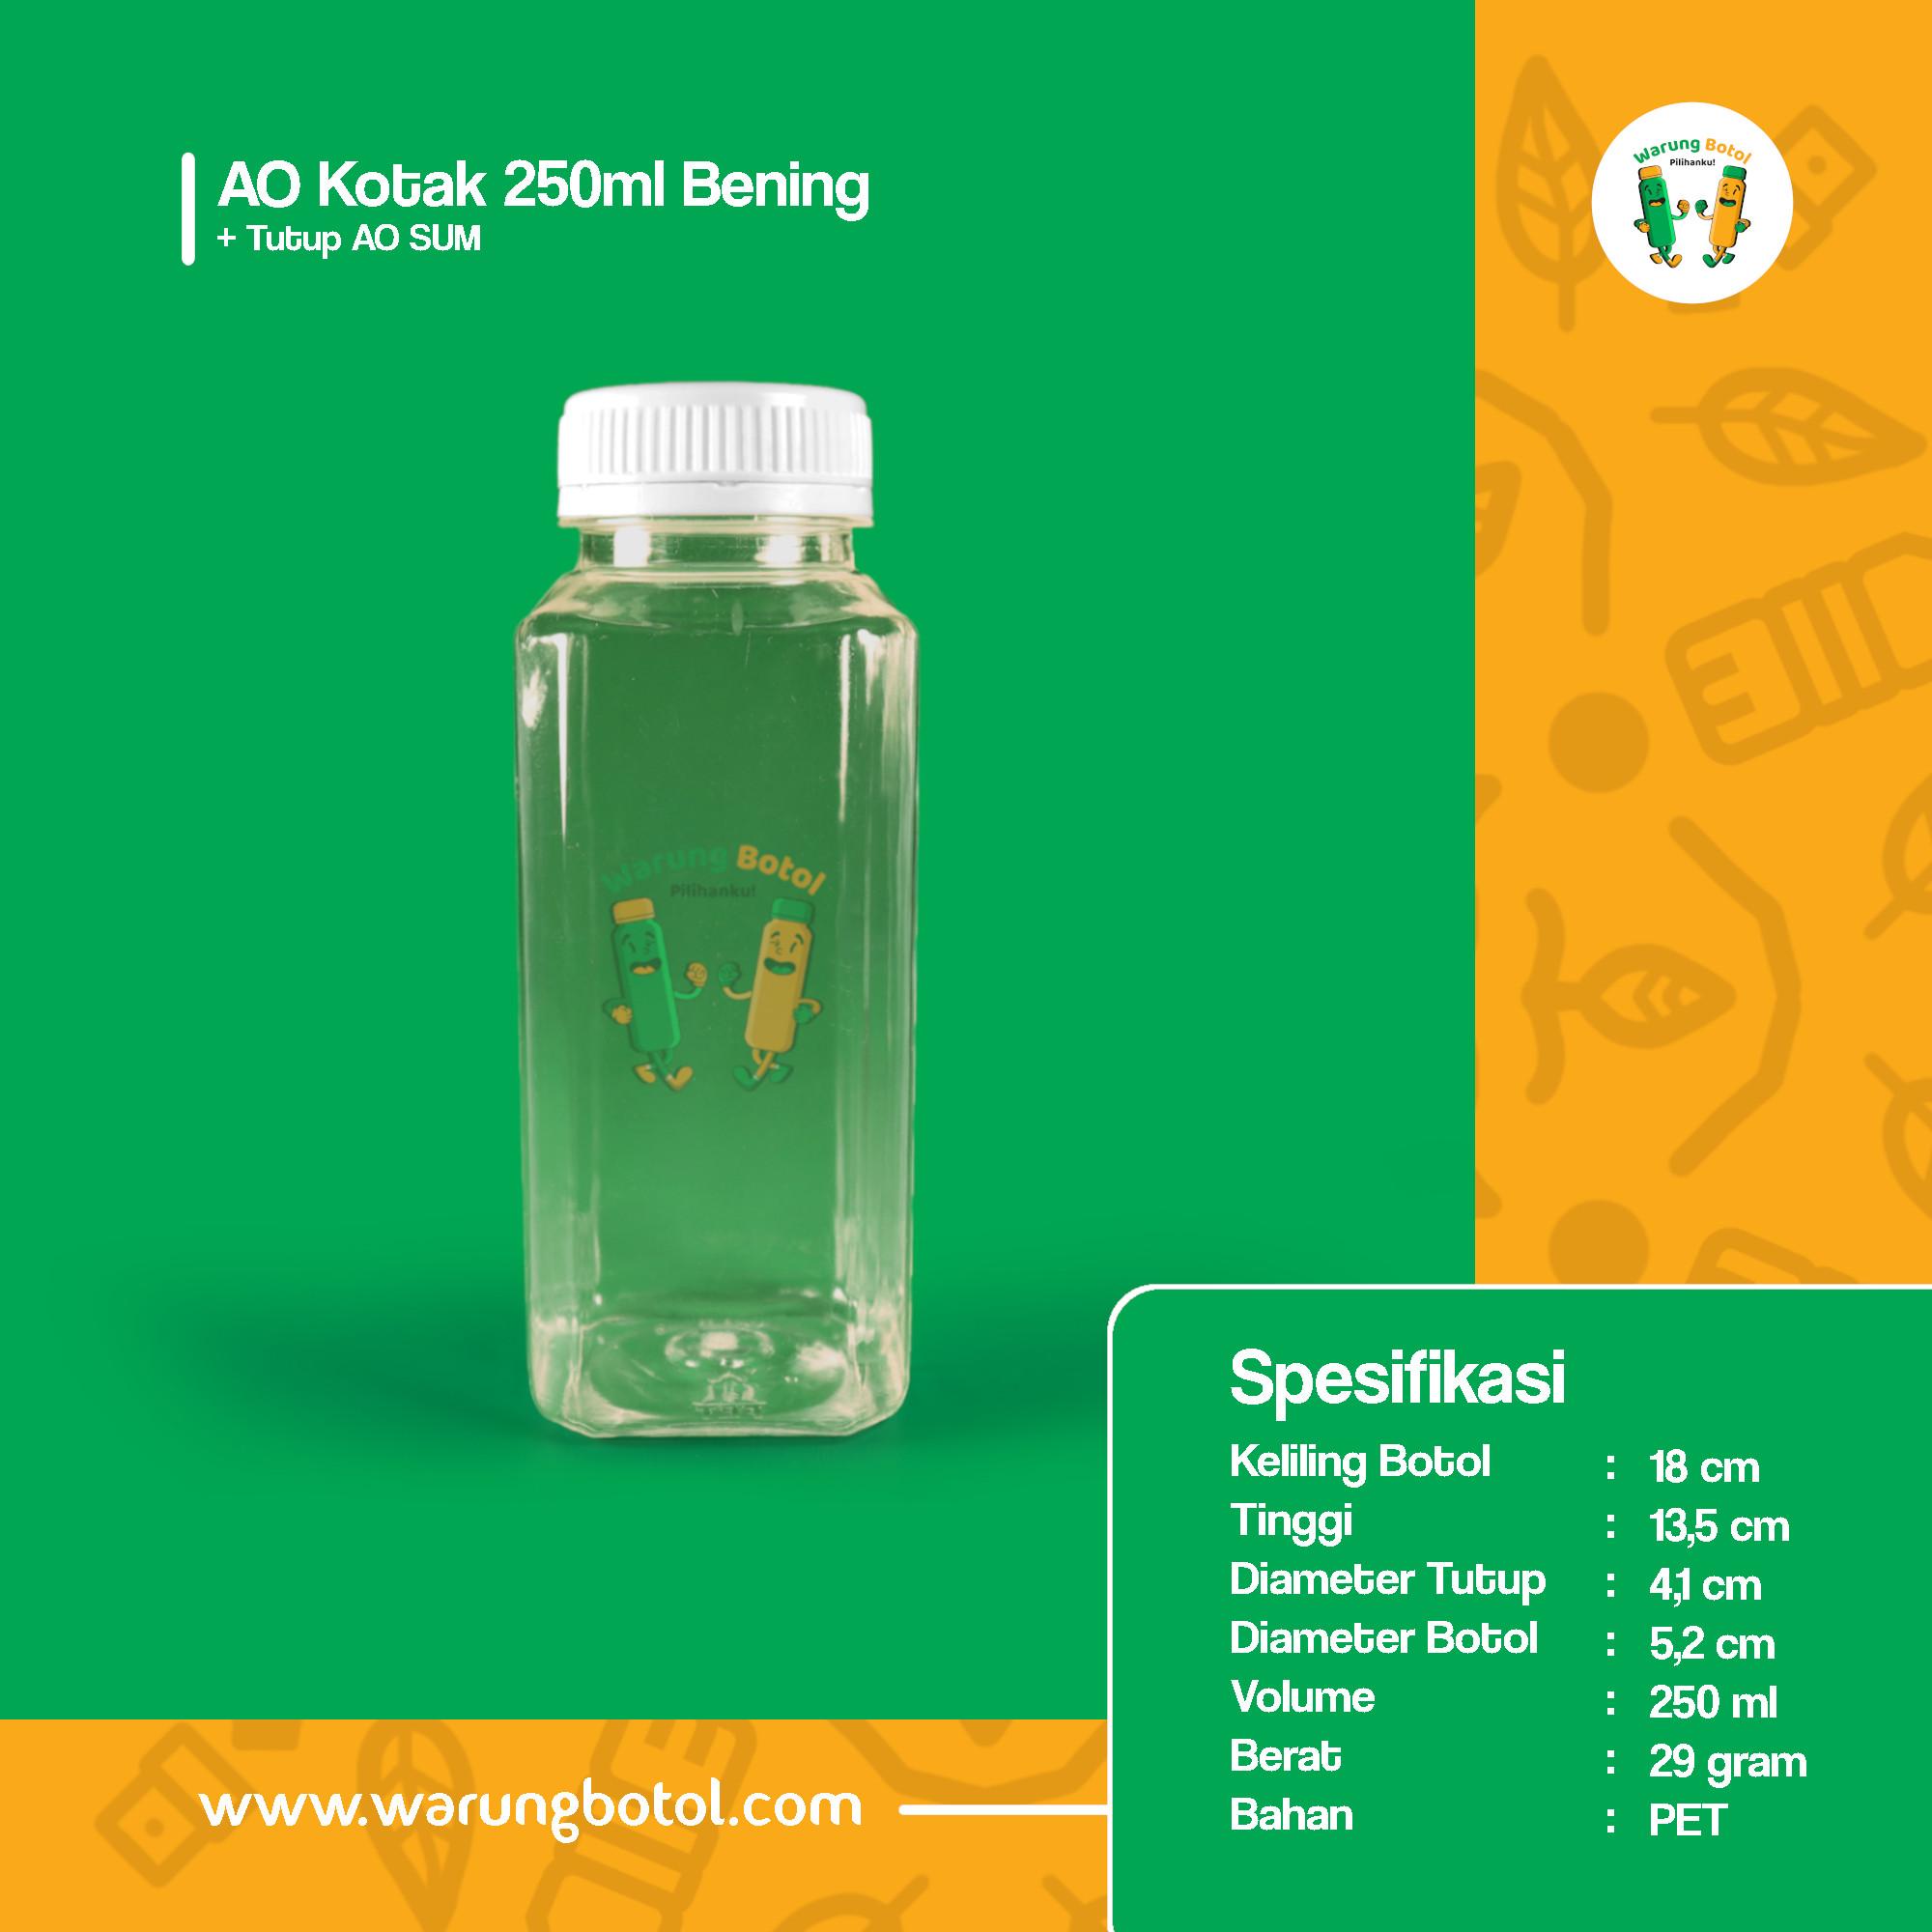 distributor jual botol kale kotak 250ml bening murah terdekat bandung jakarta bogor bekasi